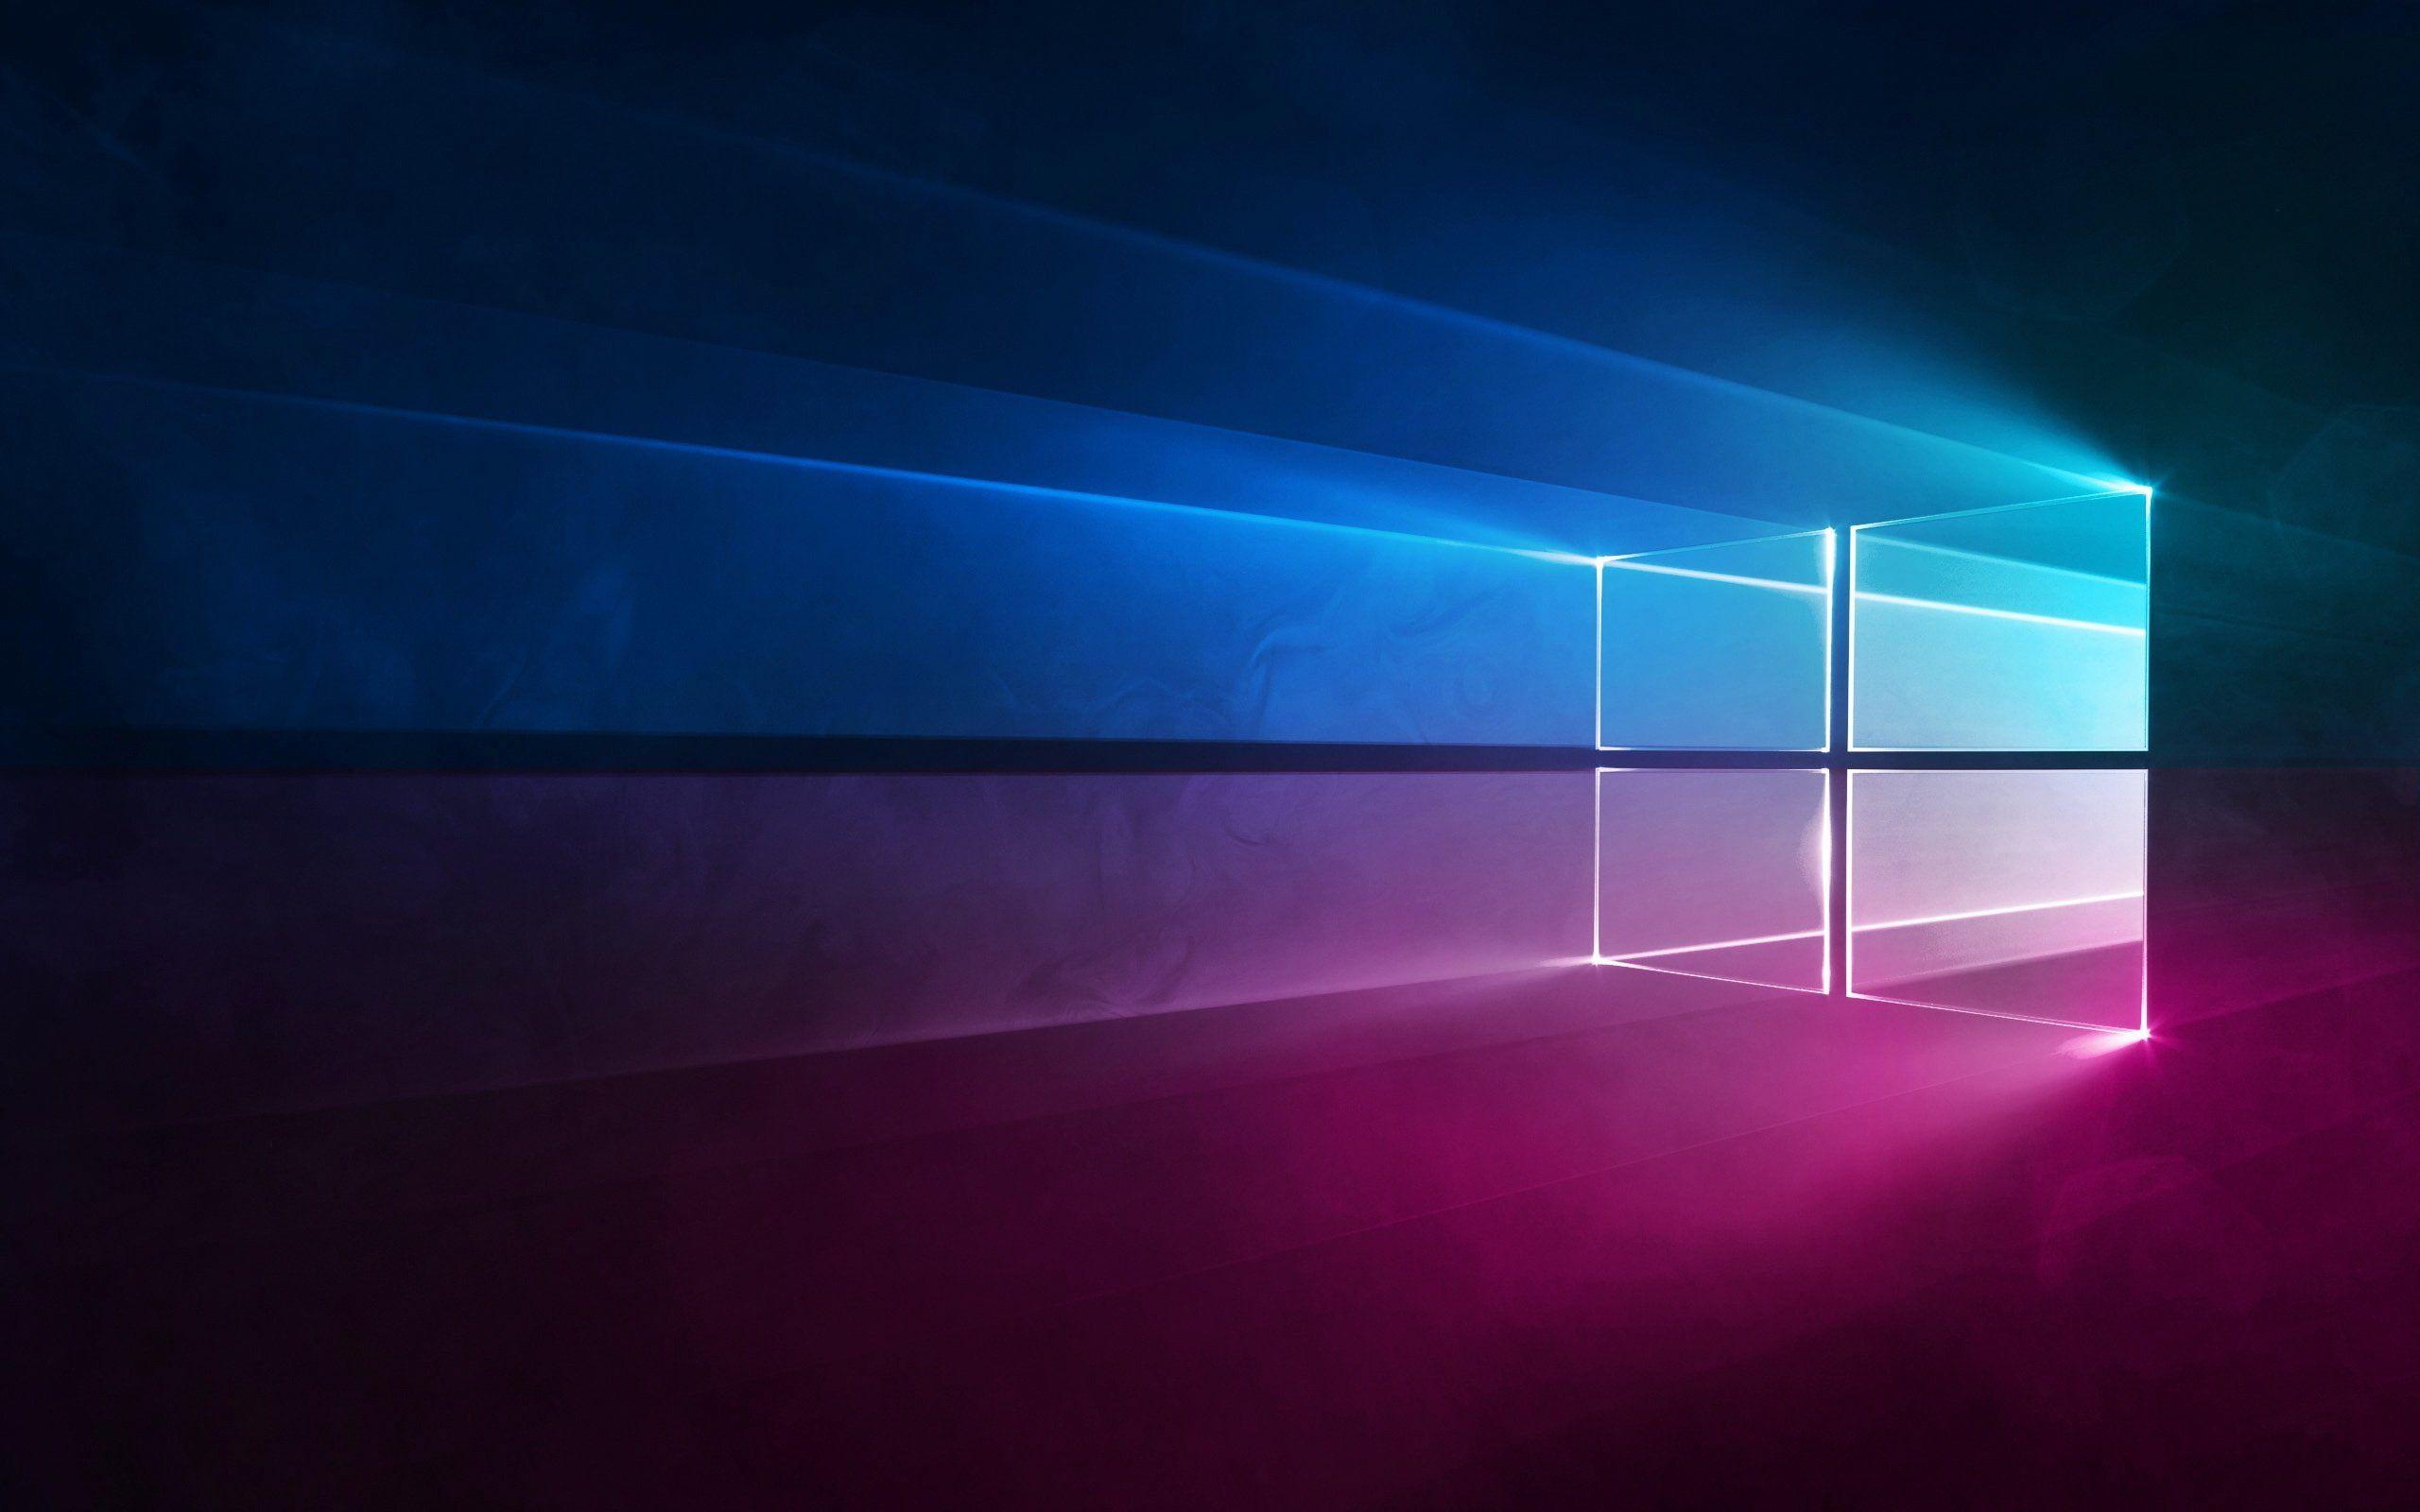 Windows 10 Microsoft Gradient Blue Purple 2k Wallpaper Hdwallpaper Desktop Windows Wallpaper Wallpaper Windows 10 Computer Wallpaper Desktop Wallpapers